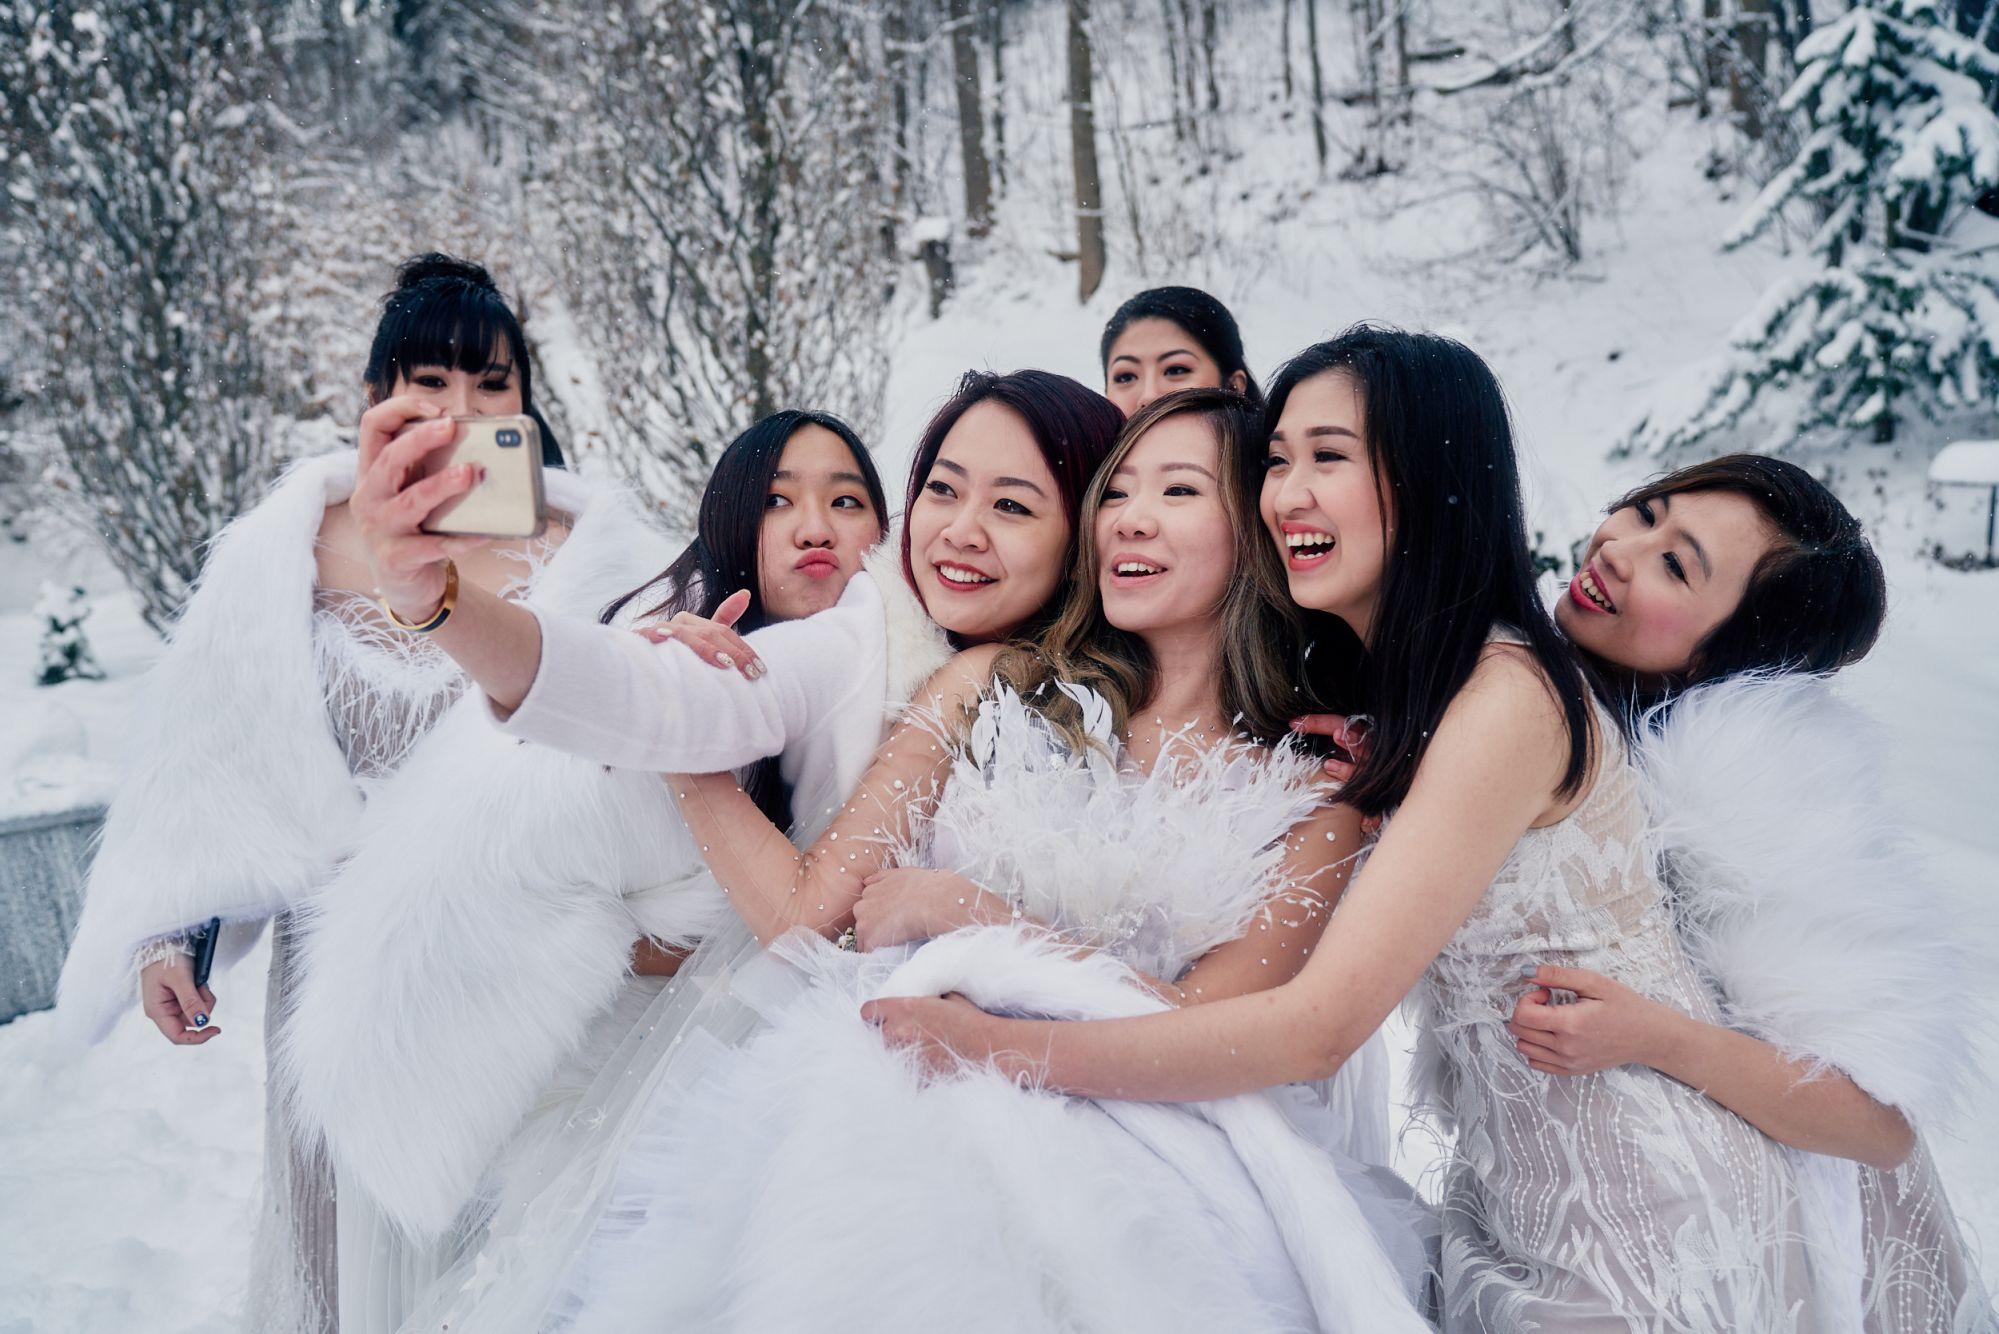 Victoria Venny Hartono, Chintara Diva Indrajaya, Ivana Agustin, Vica Natalia Nirwanda, Jessicacindy Hartono, Ellen Angelia Gunawan, Patrica Pangat